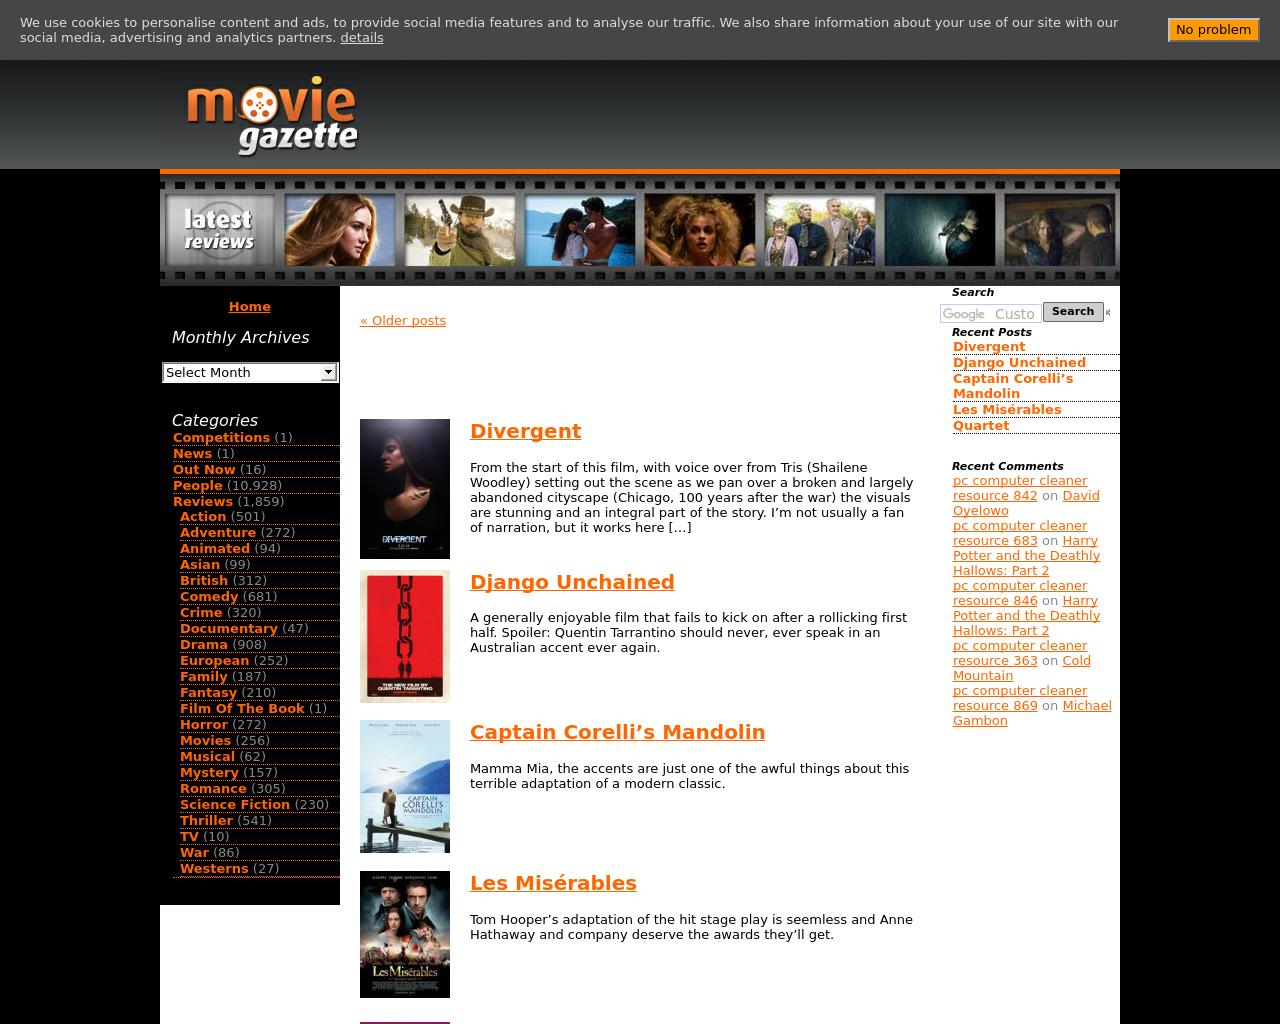 Movie-Gazette-Advertising-Reviews-Pricing